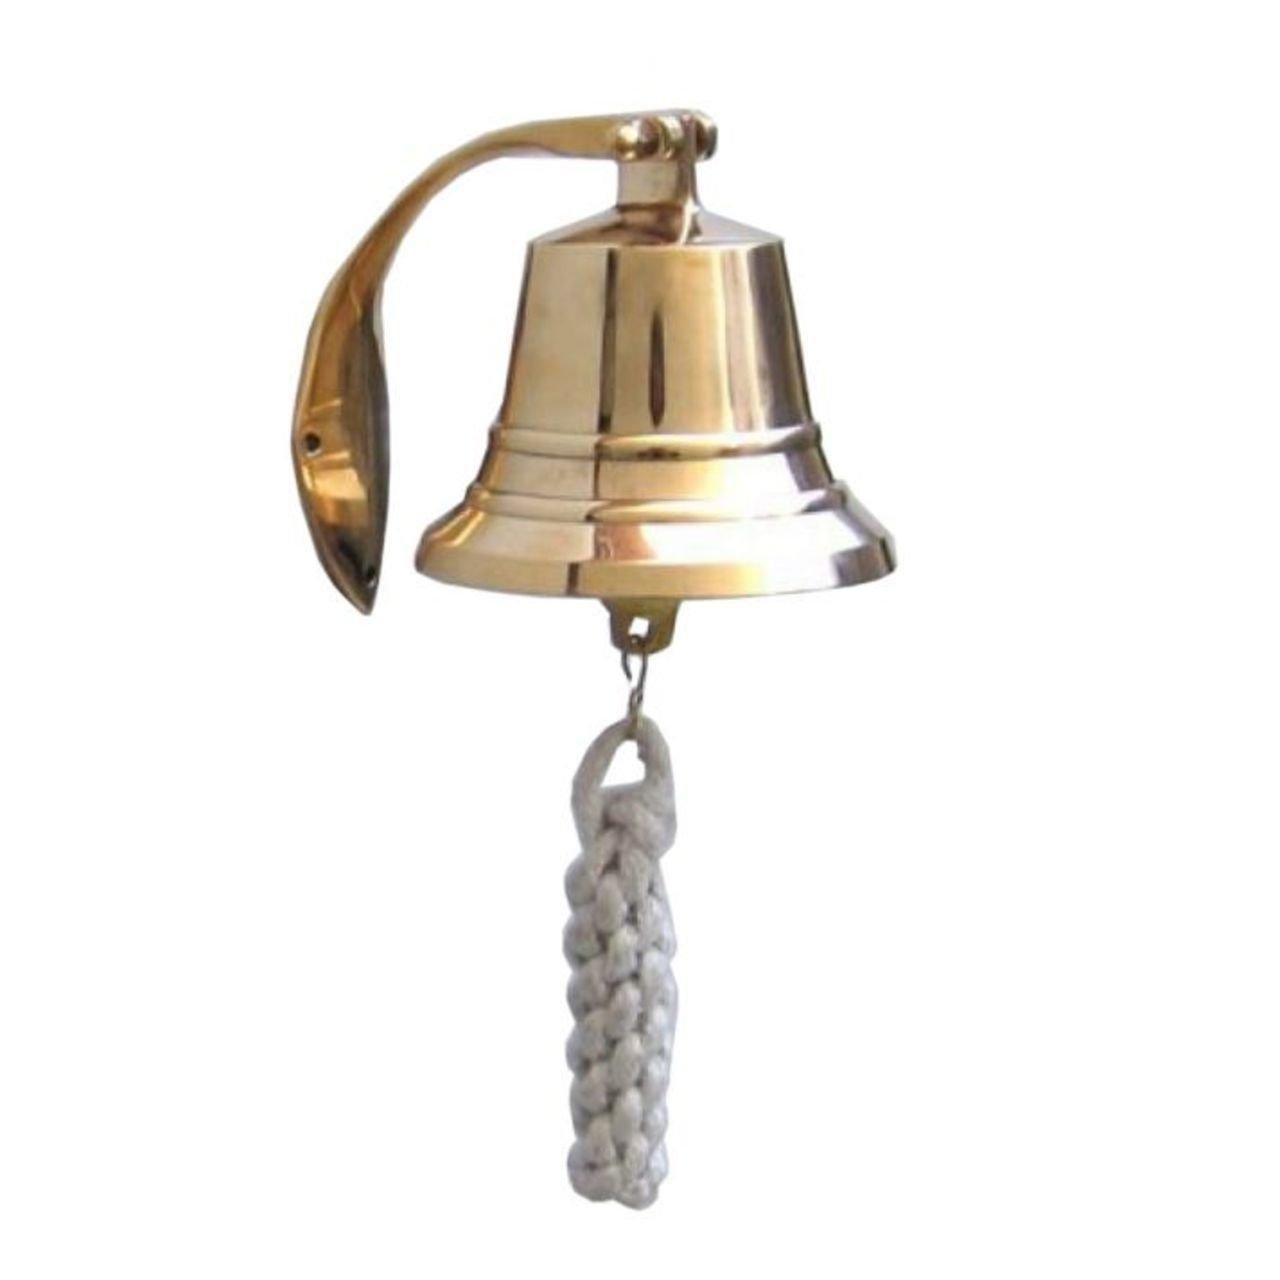 Hampton Nautical 3xglass-101 Brass Plated Hanging Harbor Bell 4'' Nautical Home Decoration, 4 inch,